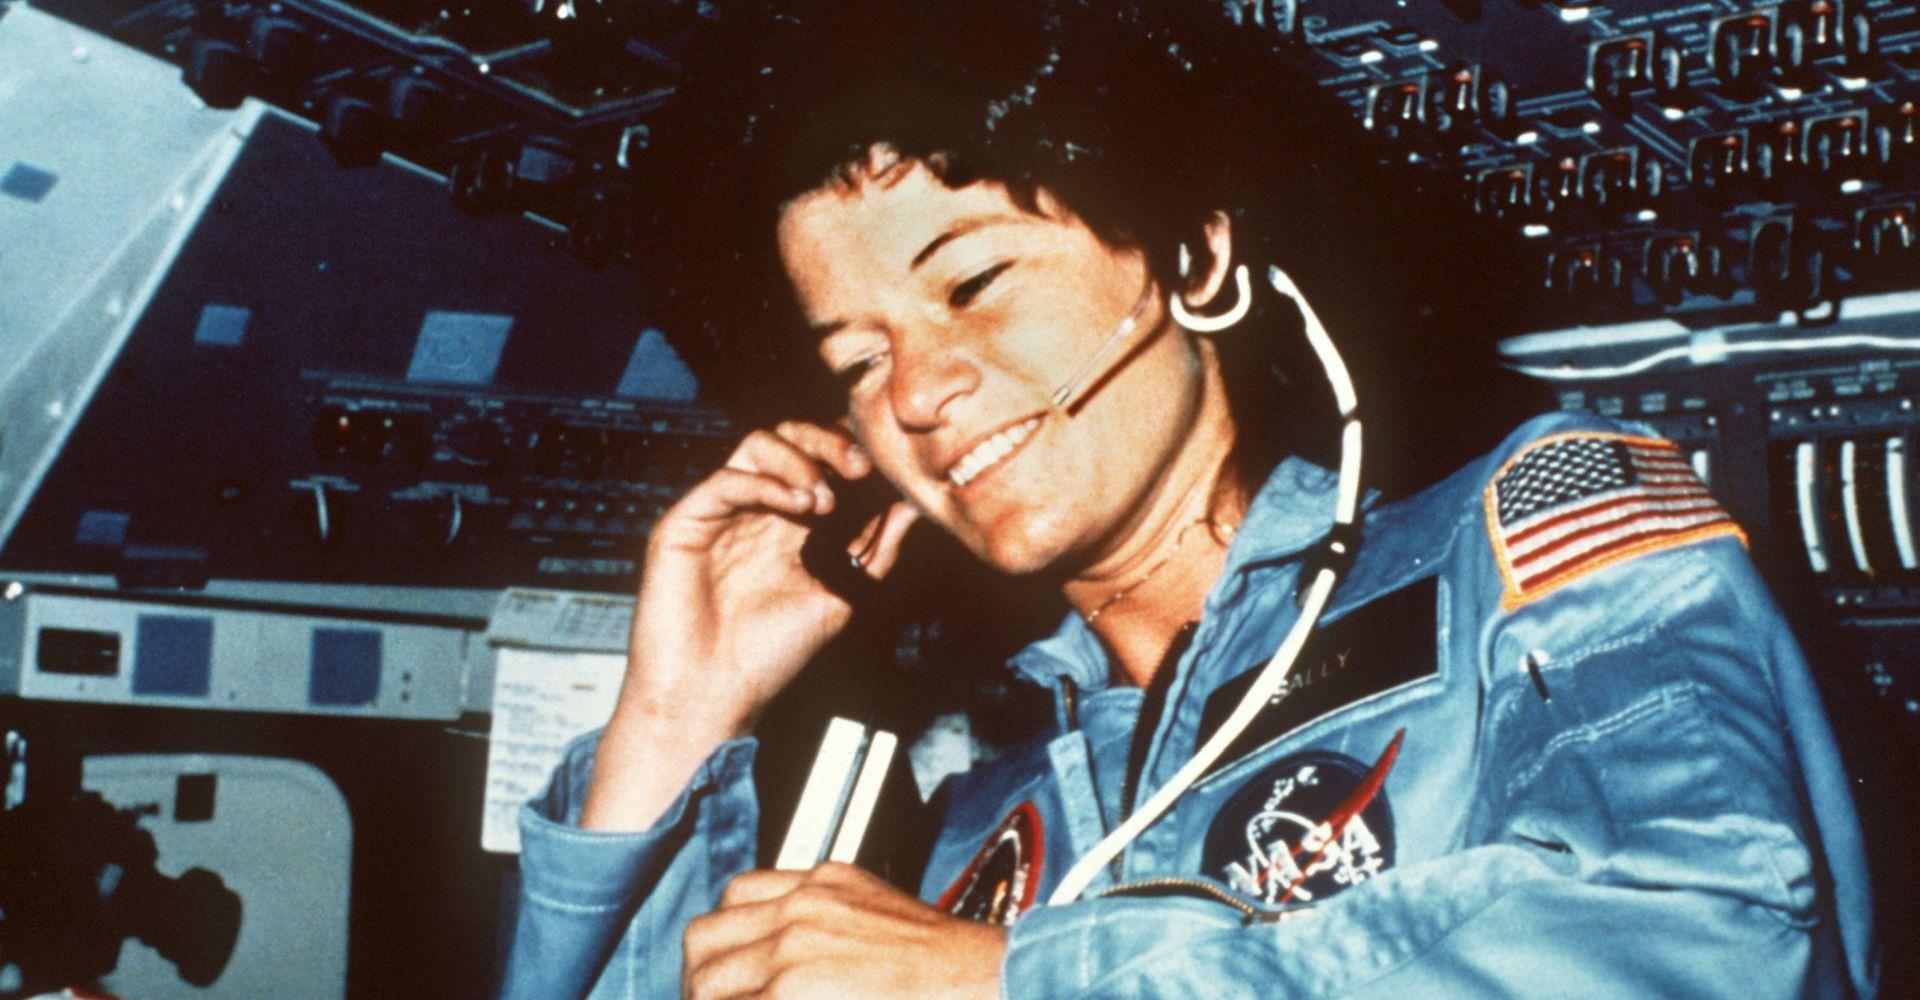 Astronautin Sally Ride